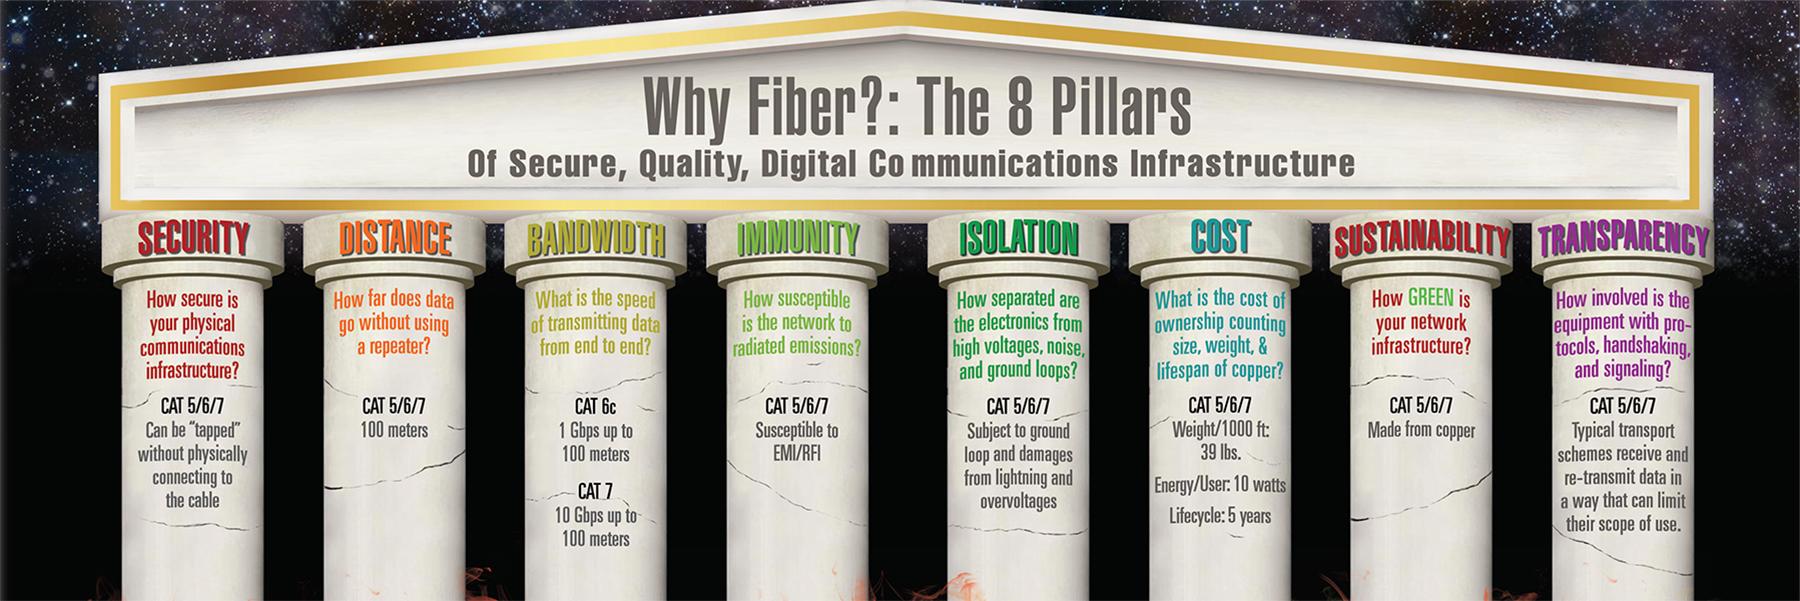 Why Fiber? Eight Pillars